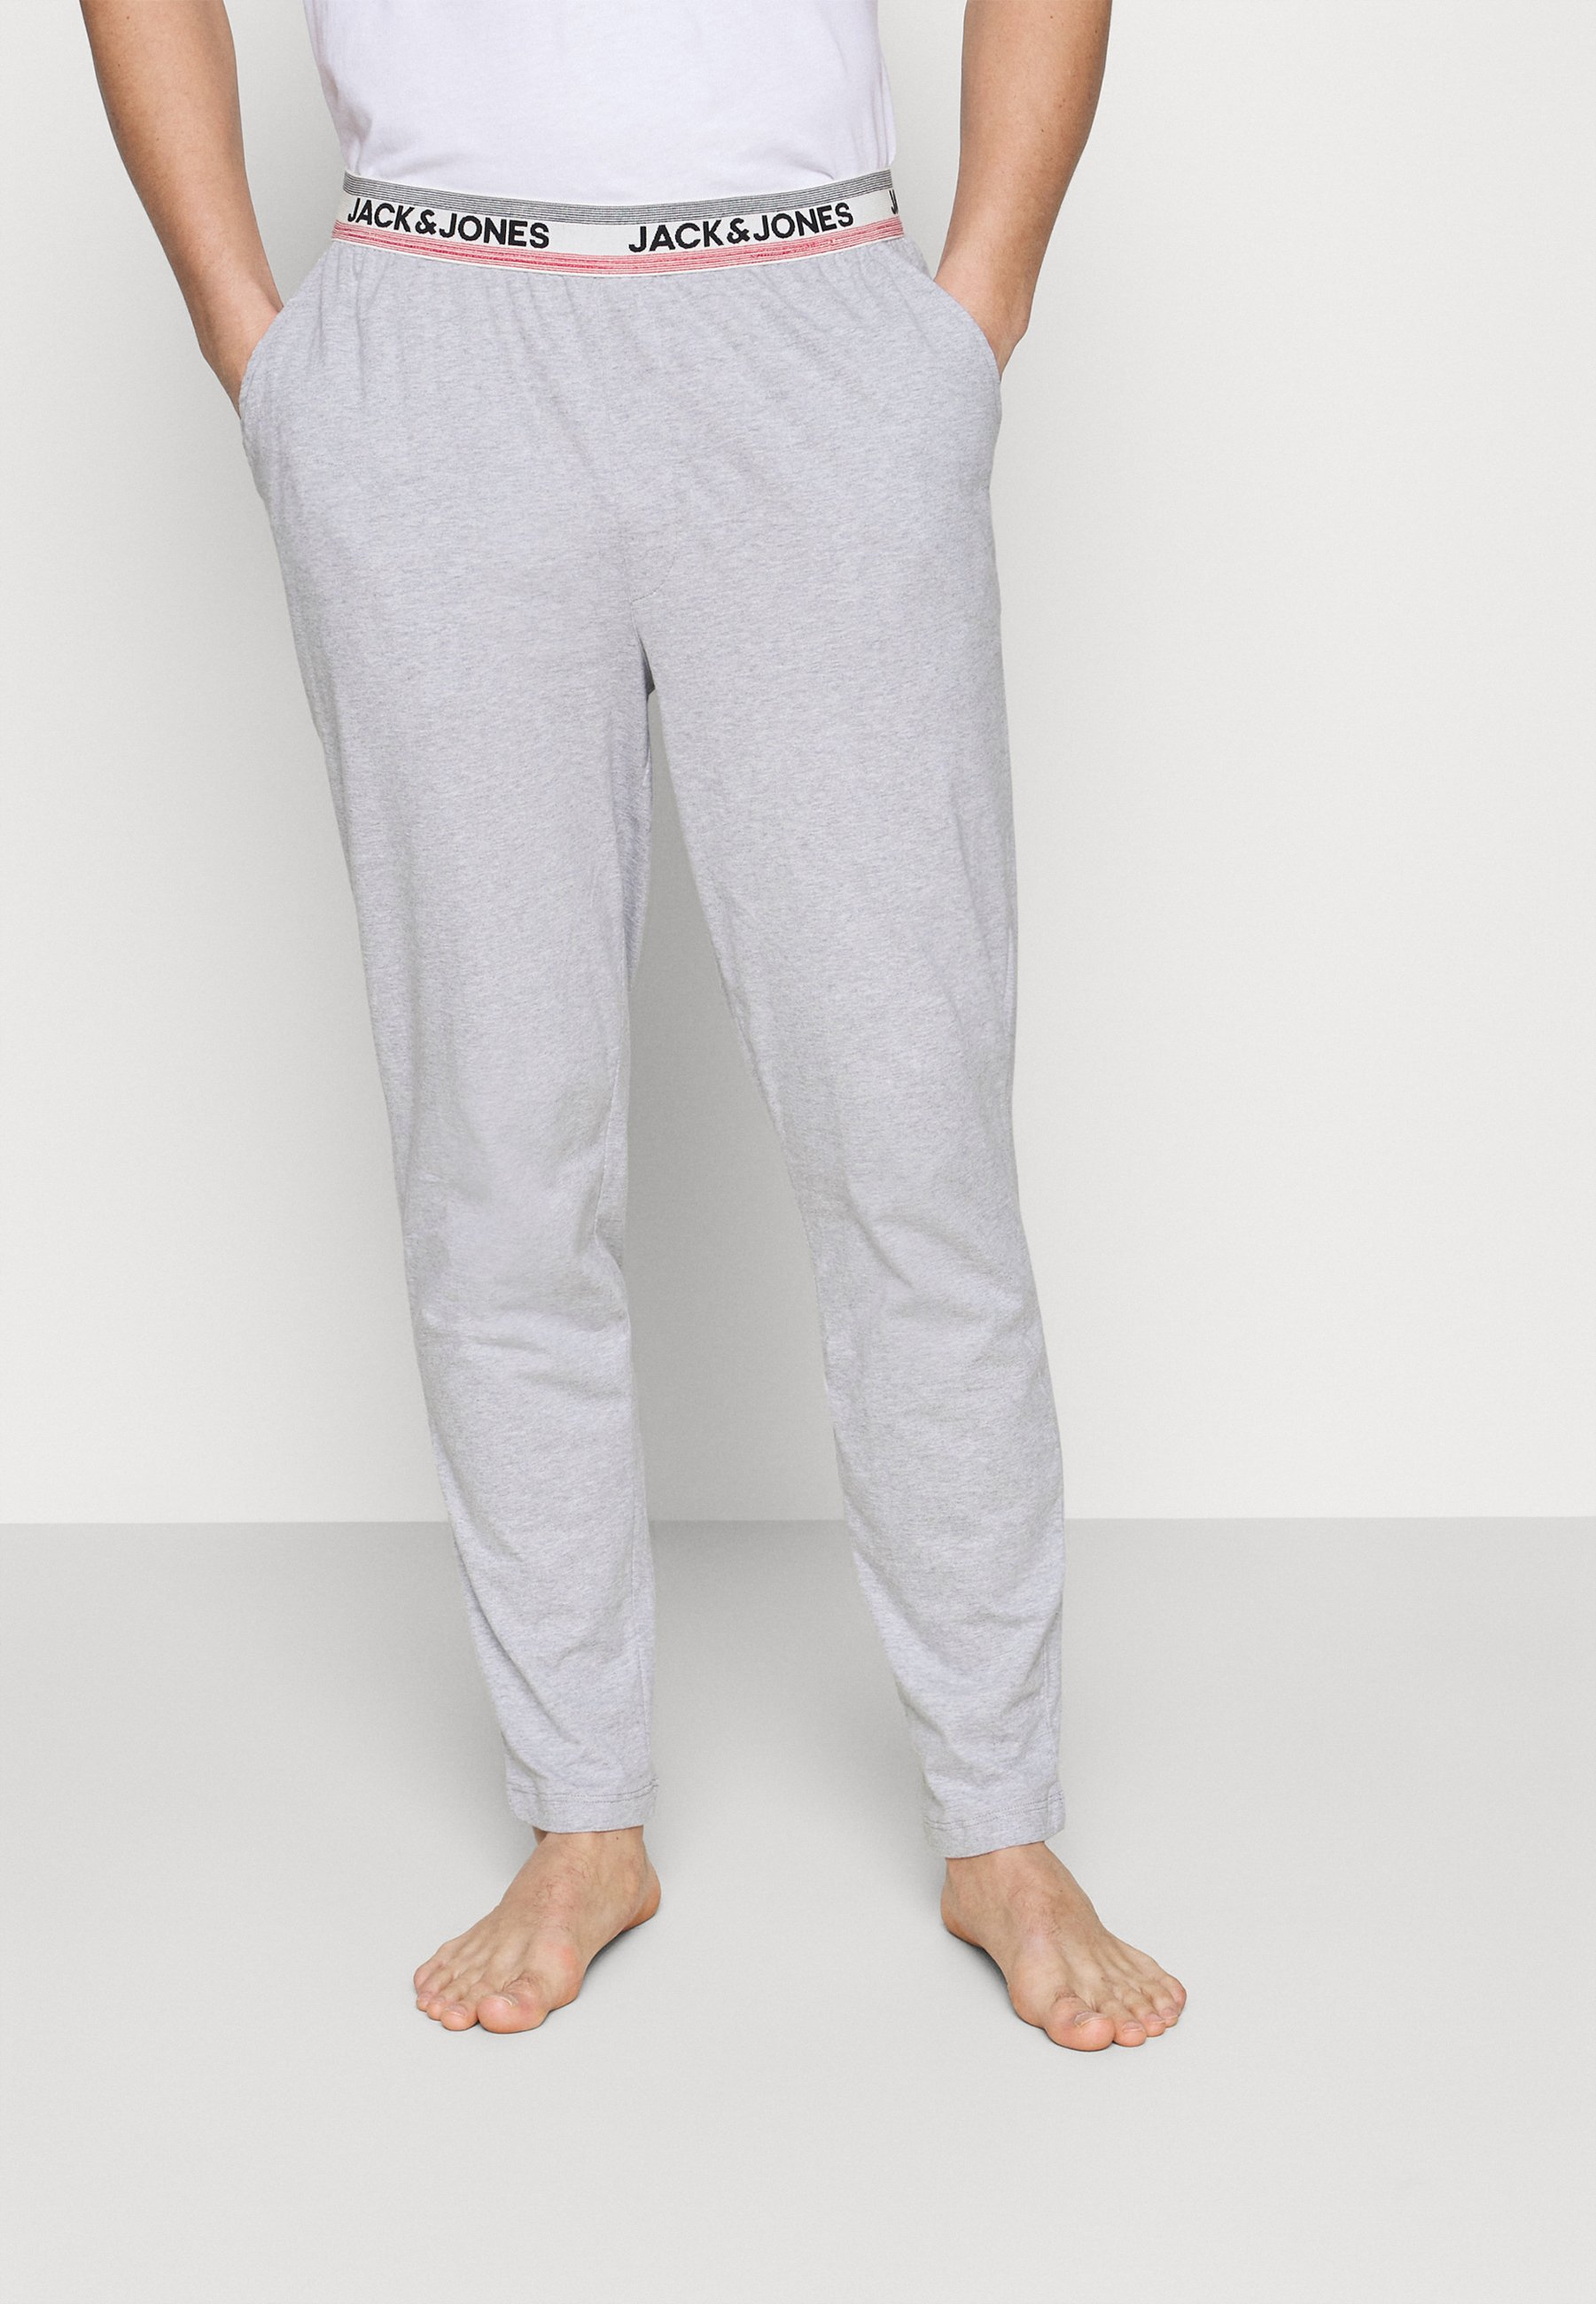 Homme JACJONES LOUNGE PANTS - Bas de pyjama